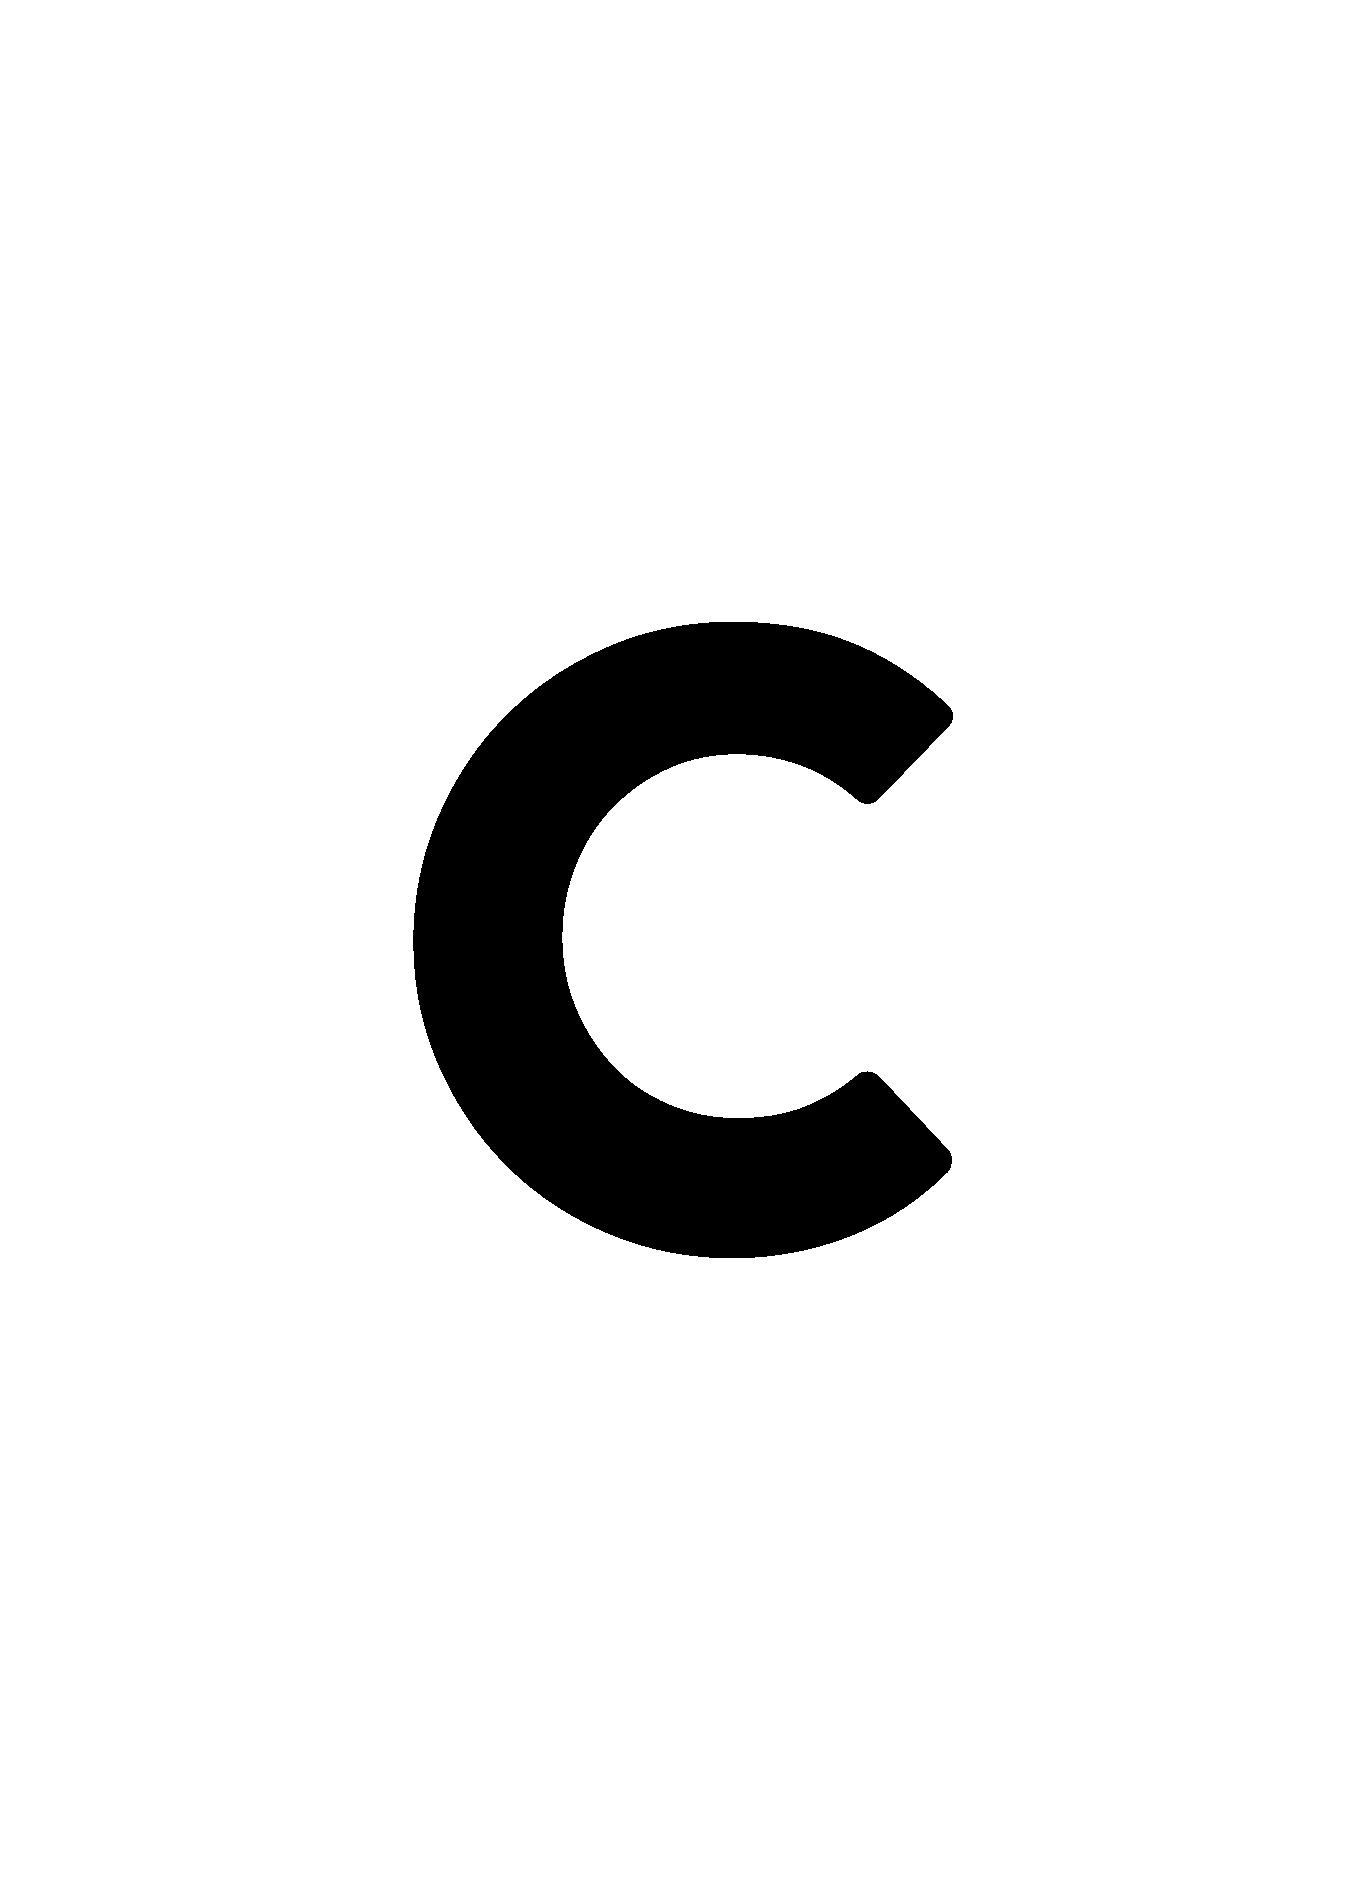 #1 Website Designing Company in India